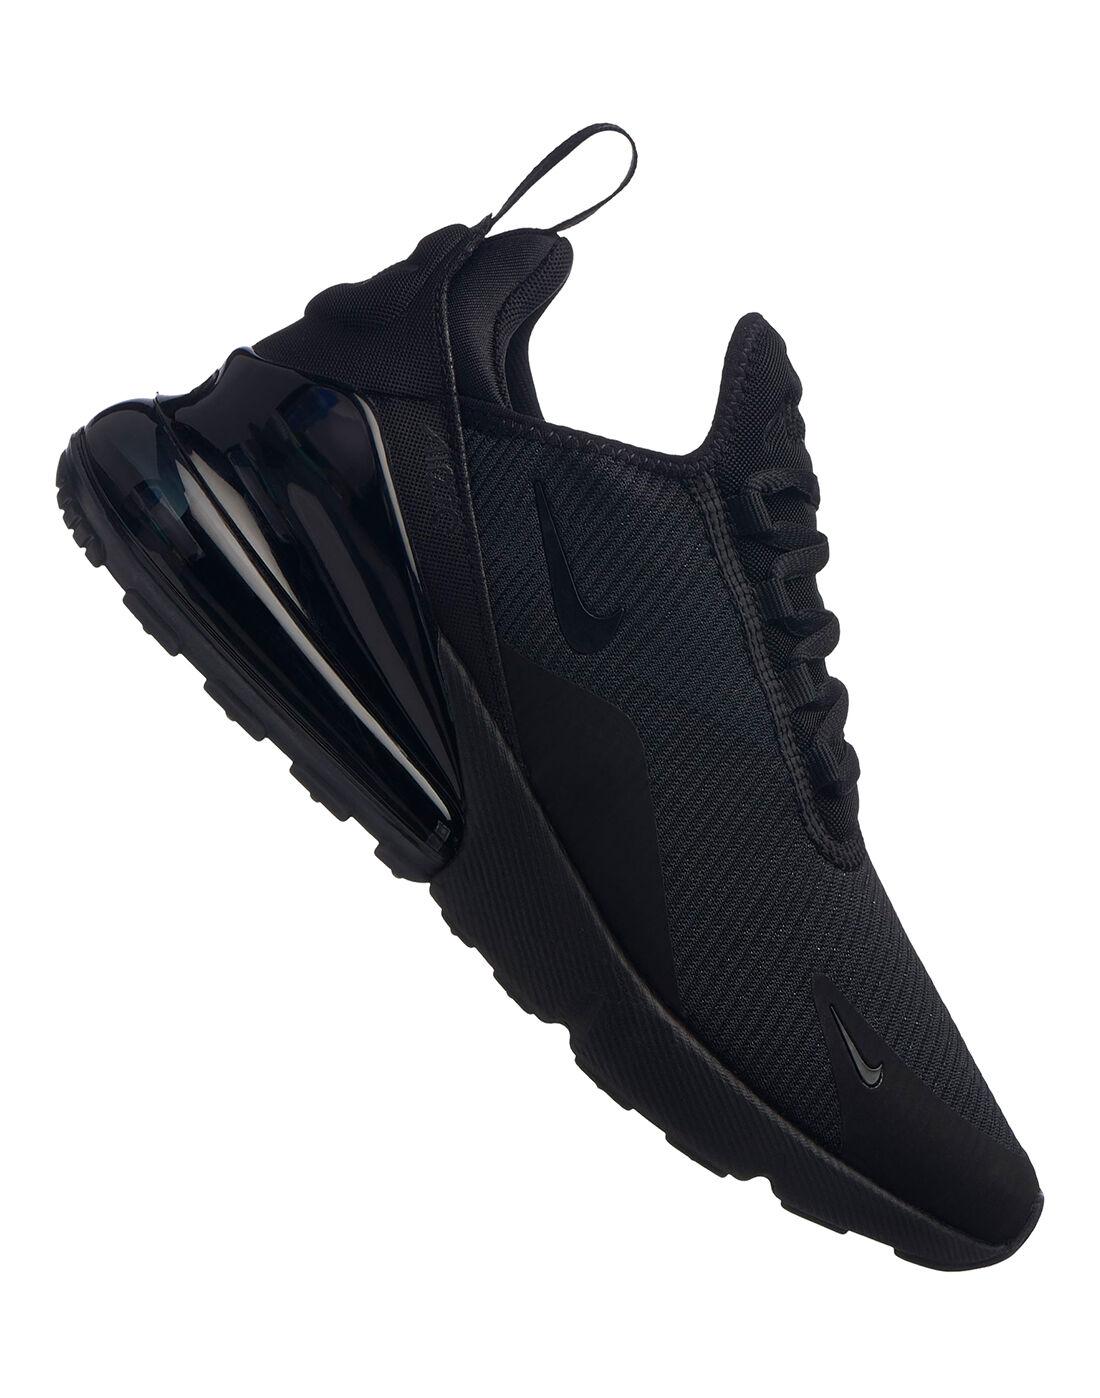 Women's Triple Black Nike Air Max 270